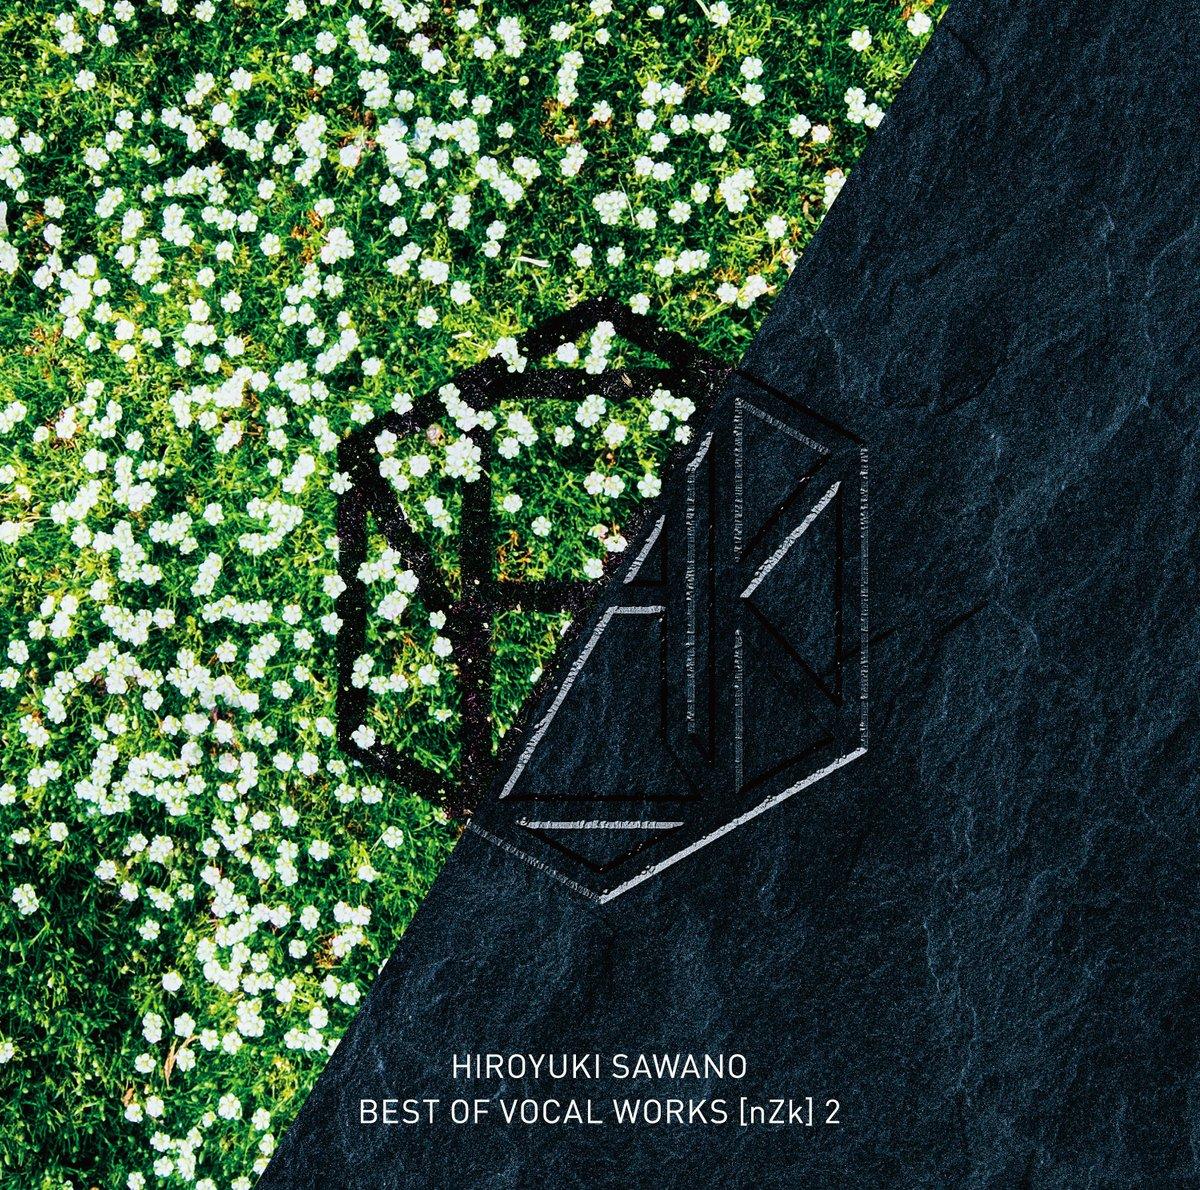 『Mika Kobayashi Unordinary 歌詞』収録の『BEST OF VOCAL WORKS [nZk] HIROYUKI SAWANO 2』ジャケット